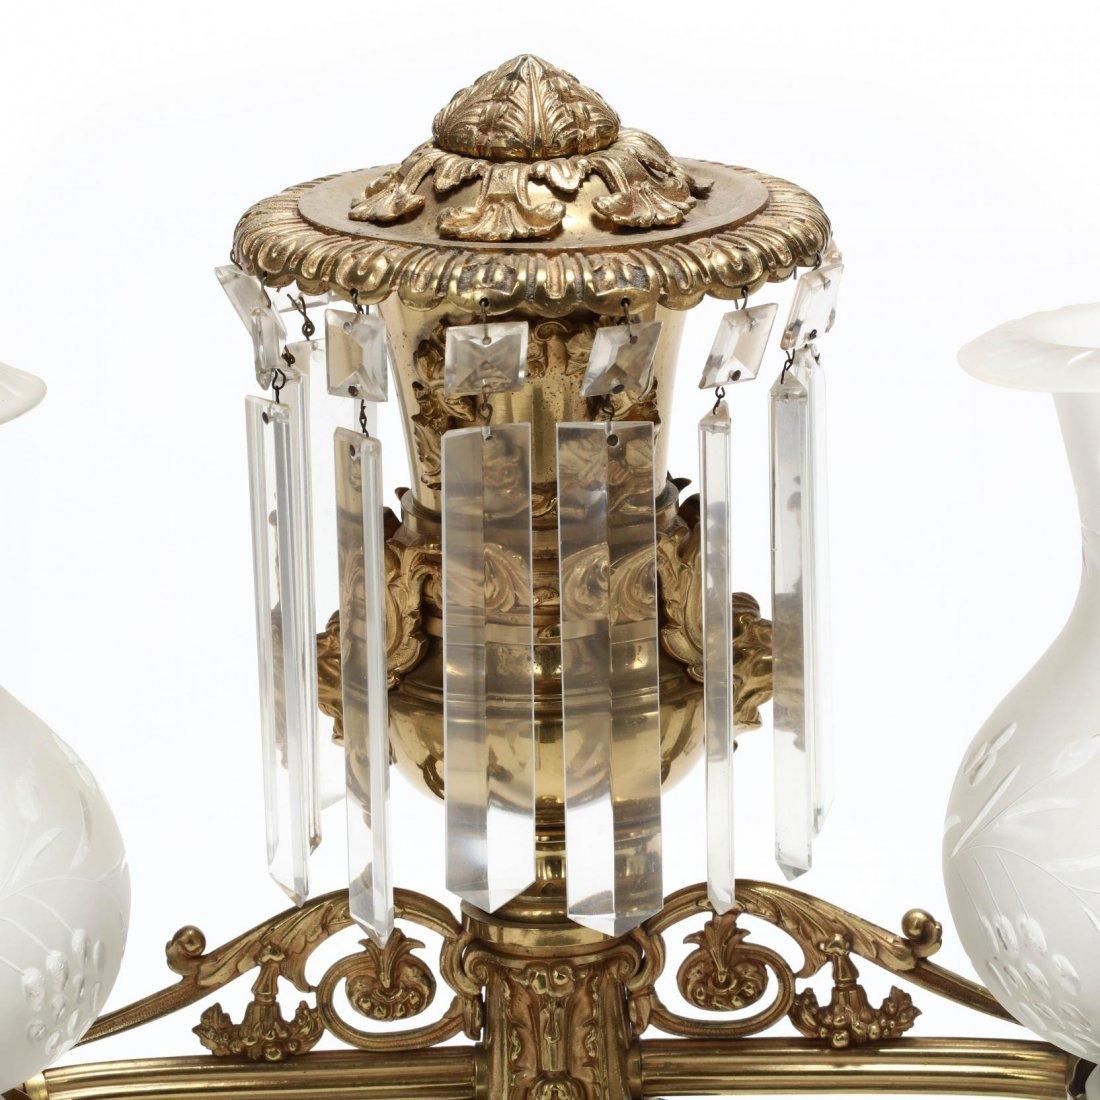 Lewis Veron & Co., Pair of Argand Lamps - 5